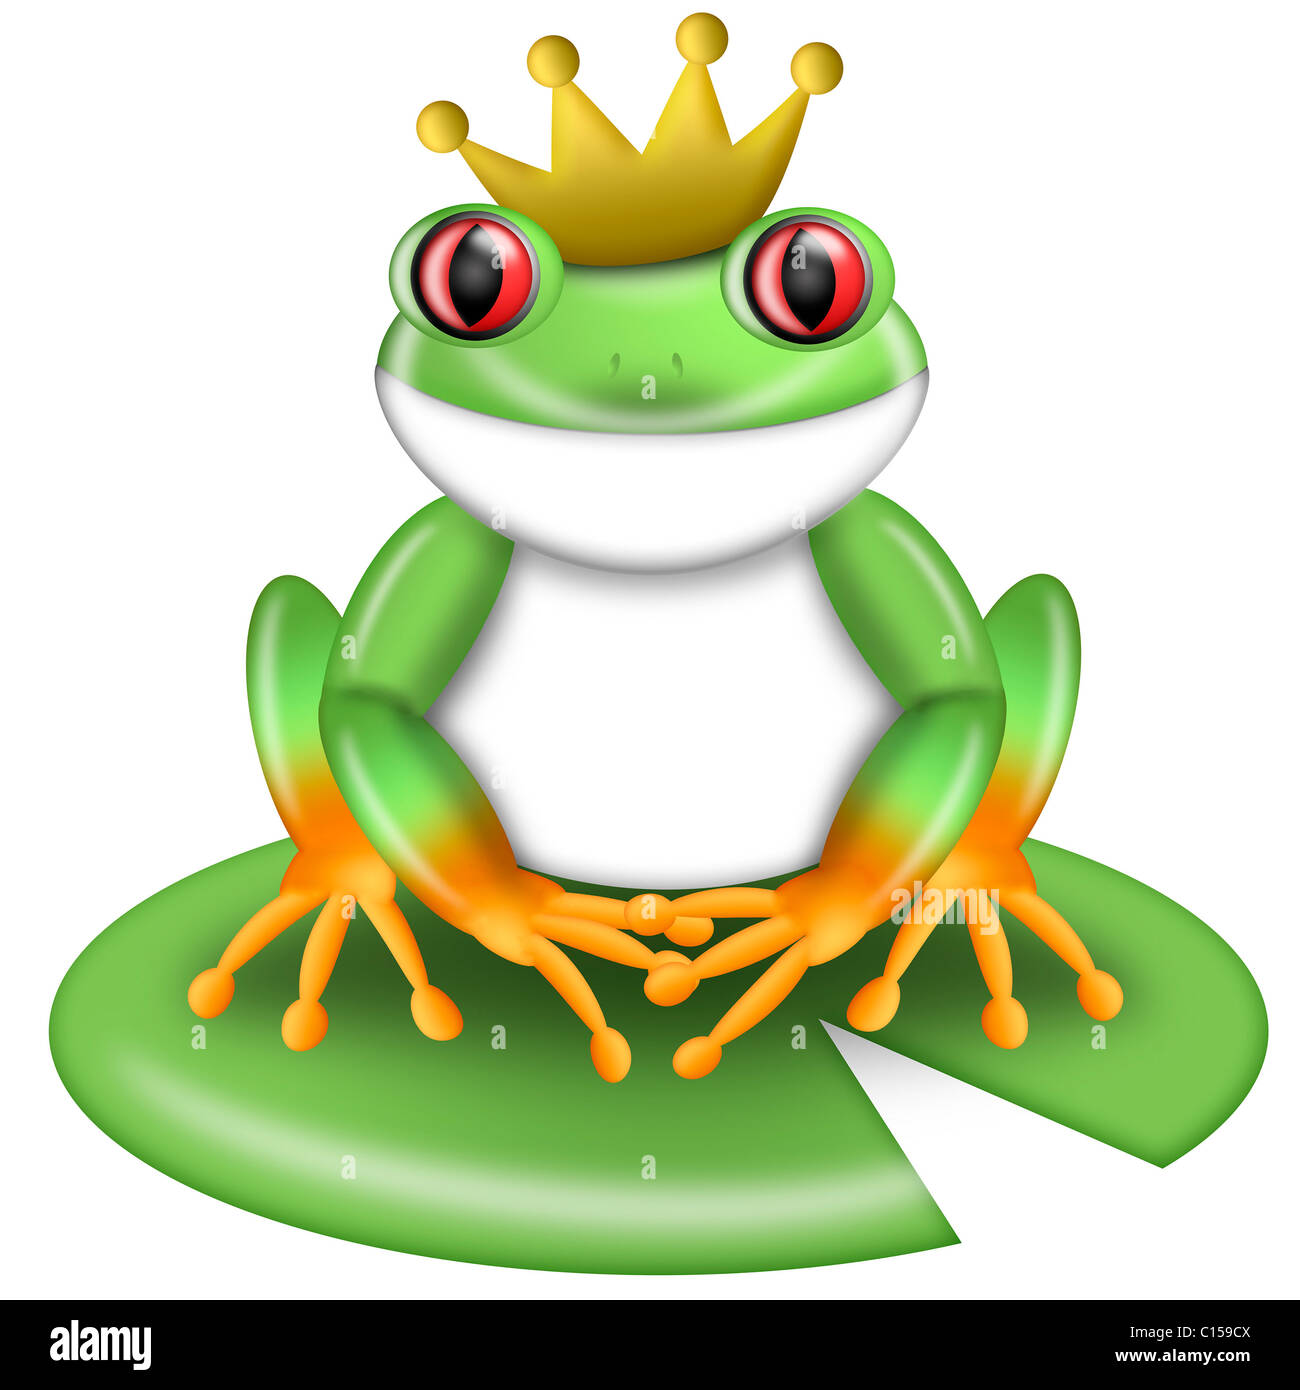 Frog Rain Illustration Imágenes De Stock & Frog Rain Illustration ...